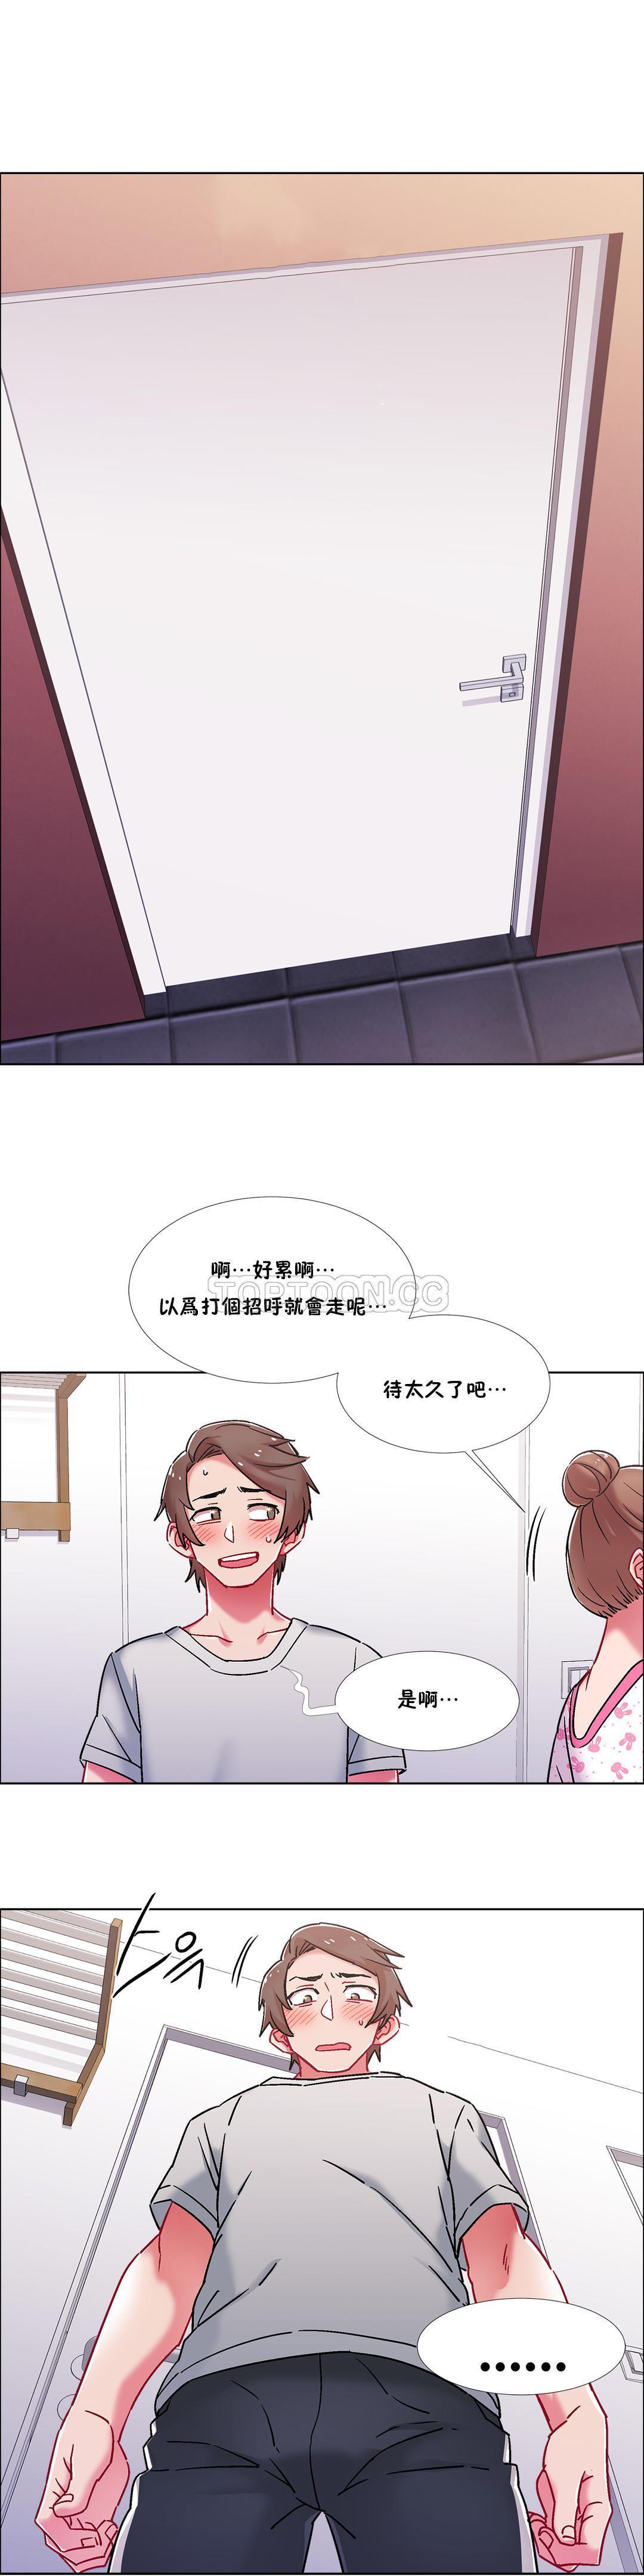 [Studio Wannabe] Rental Girls | 出租女郎 Ch. 33-58 [Chinese]  第二季 完结 264